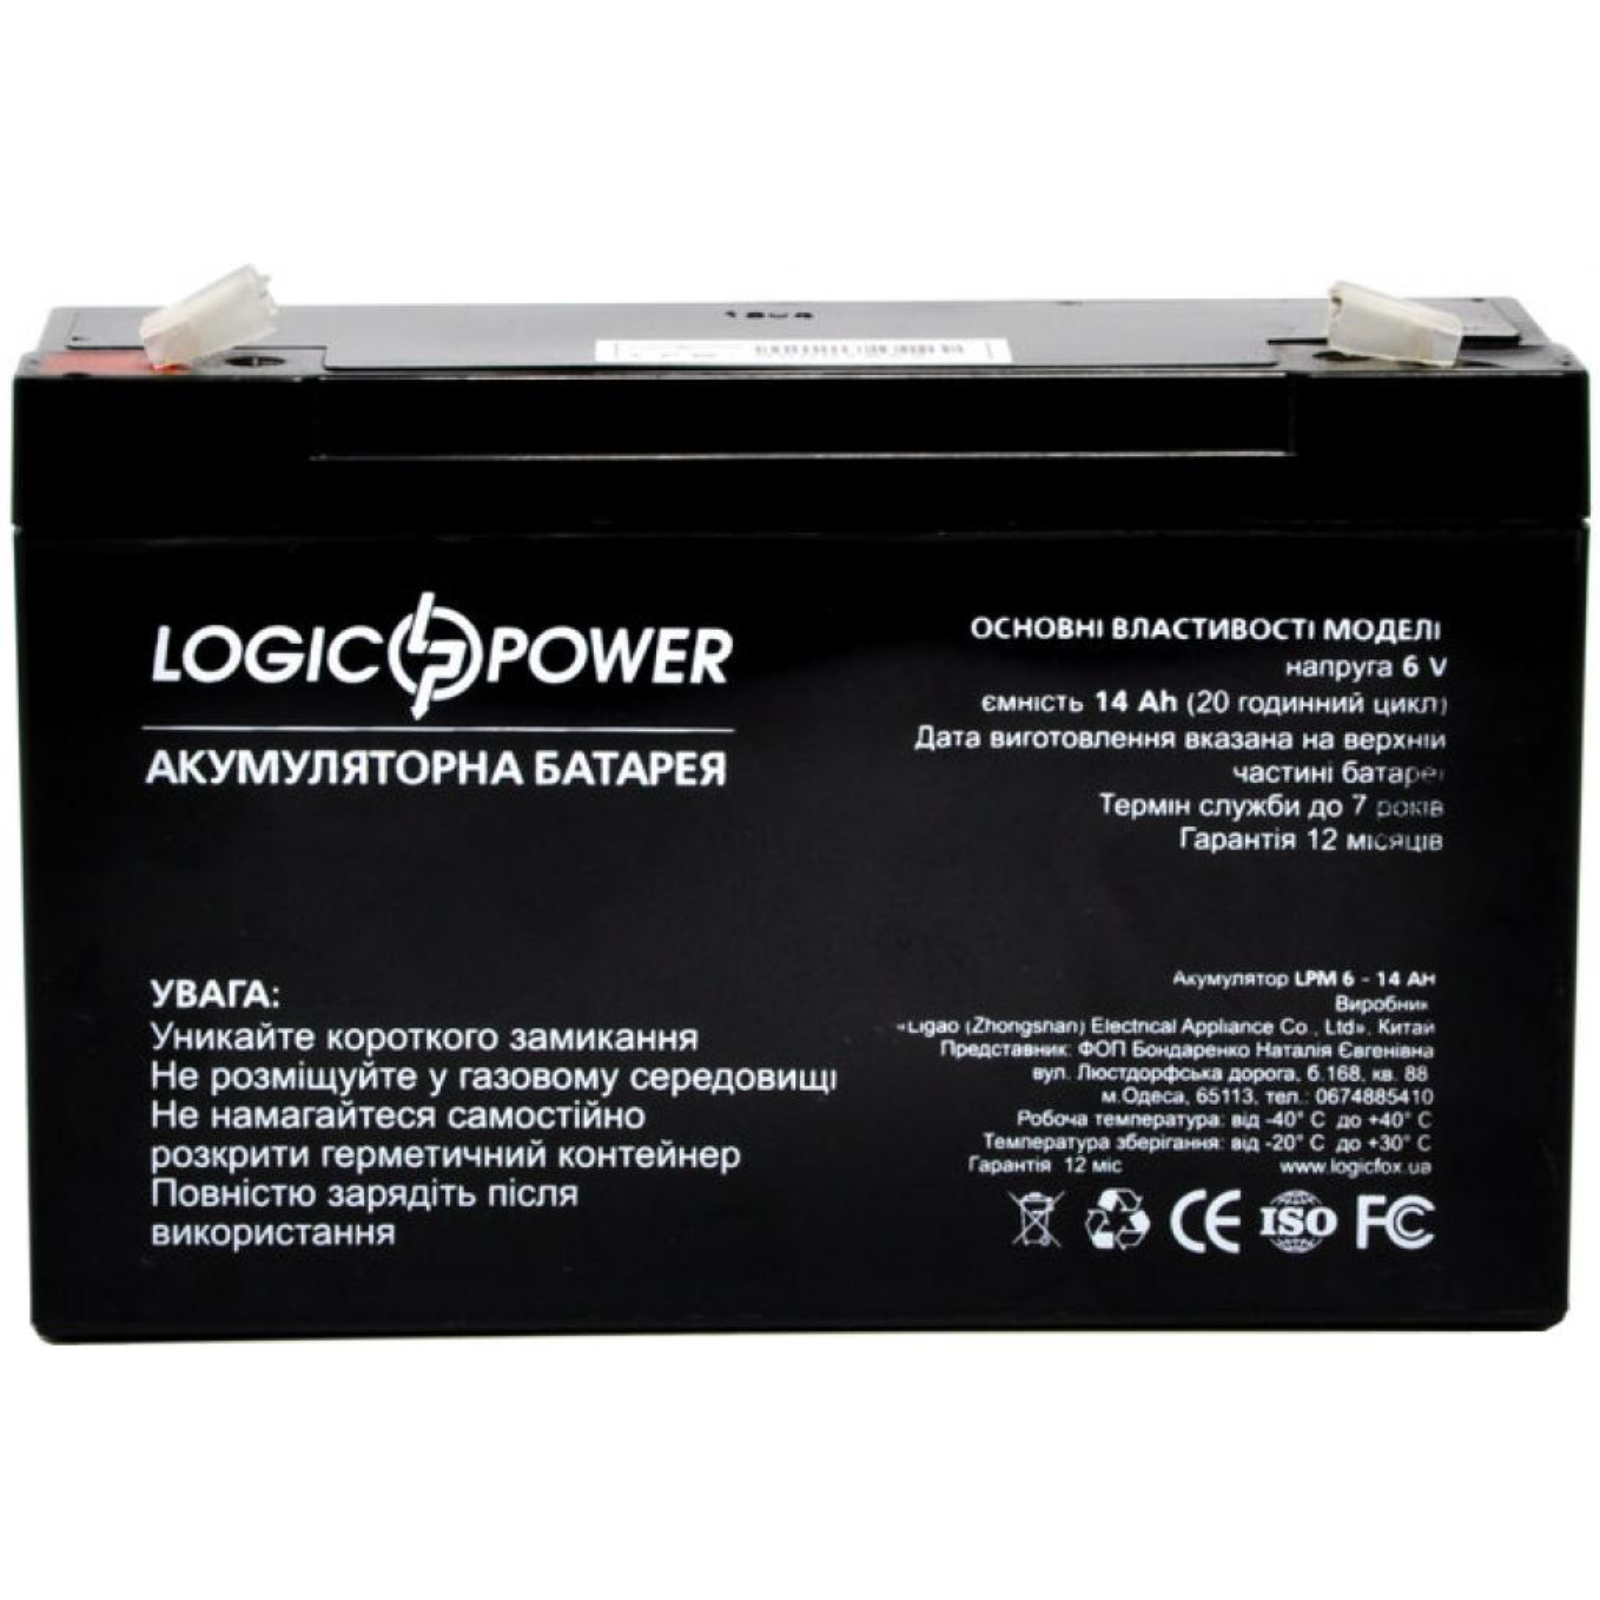 Батарея к ИБП LogicPower LPM 6В 14 Ач (4160) изображение 3